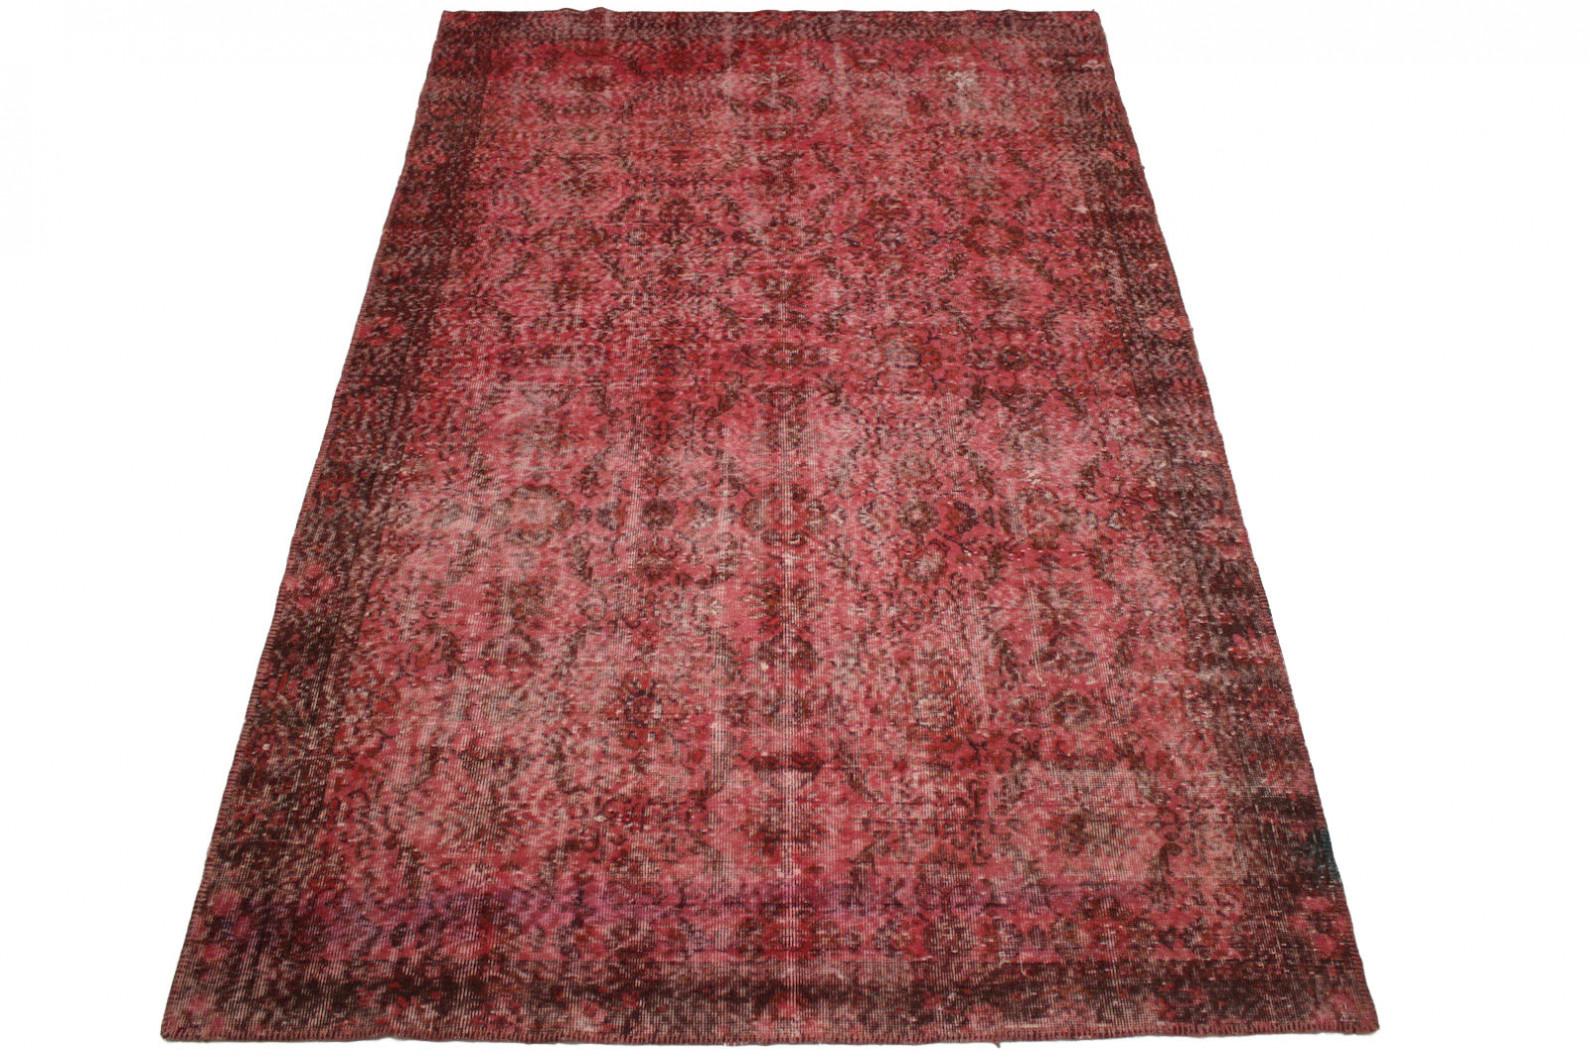 vintage teppich rot rosa in 290x180cm 1001 293208 bei. Black Bedroom Furniture Sets. Home Design Ideas